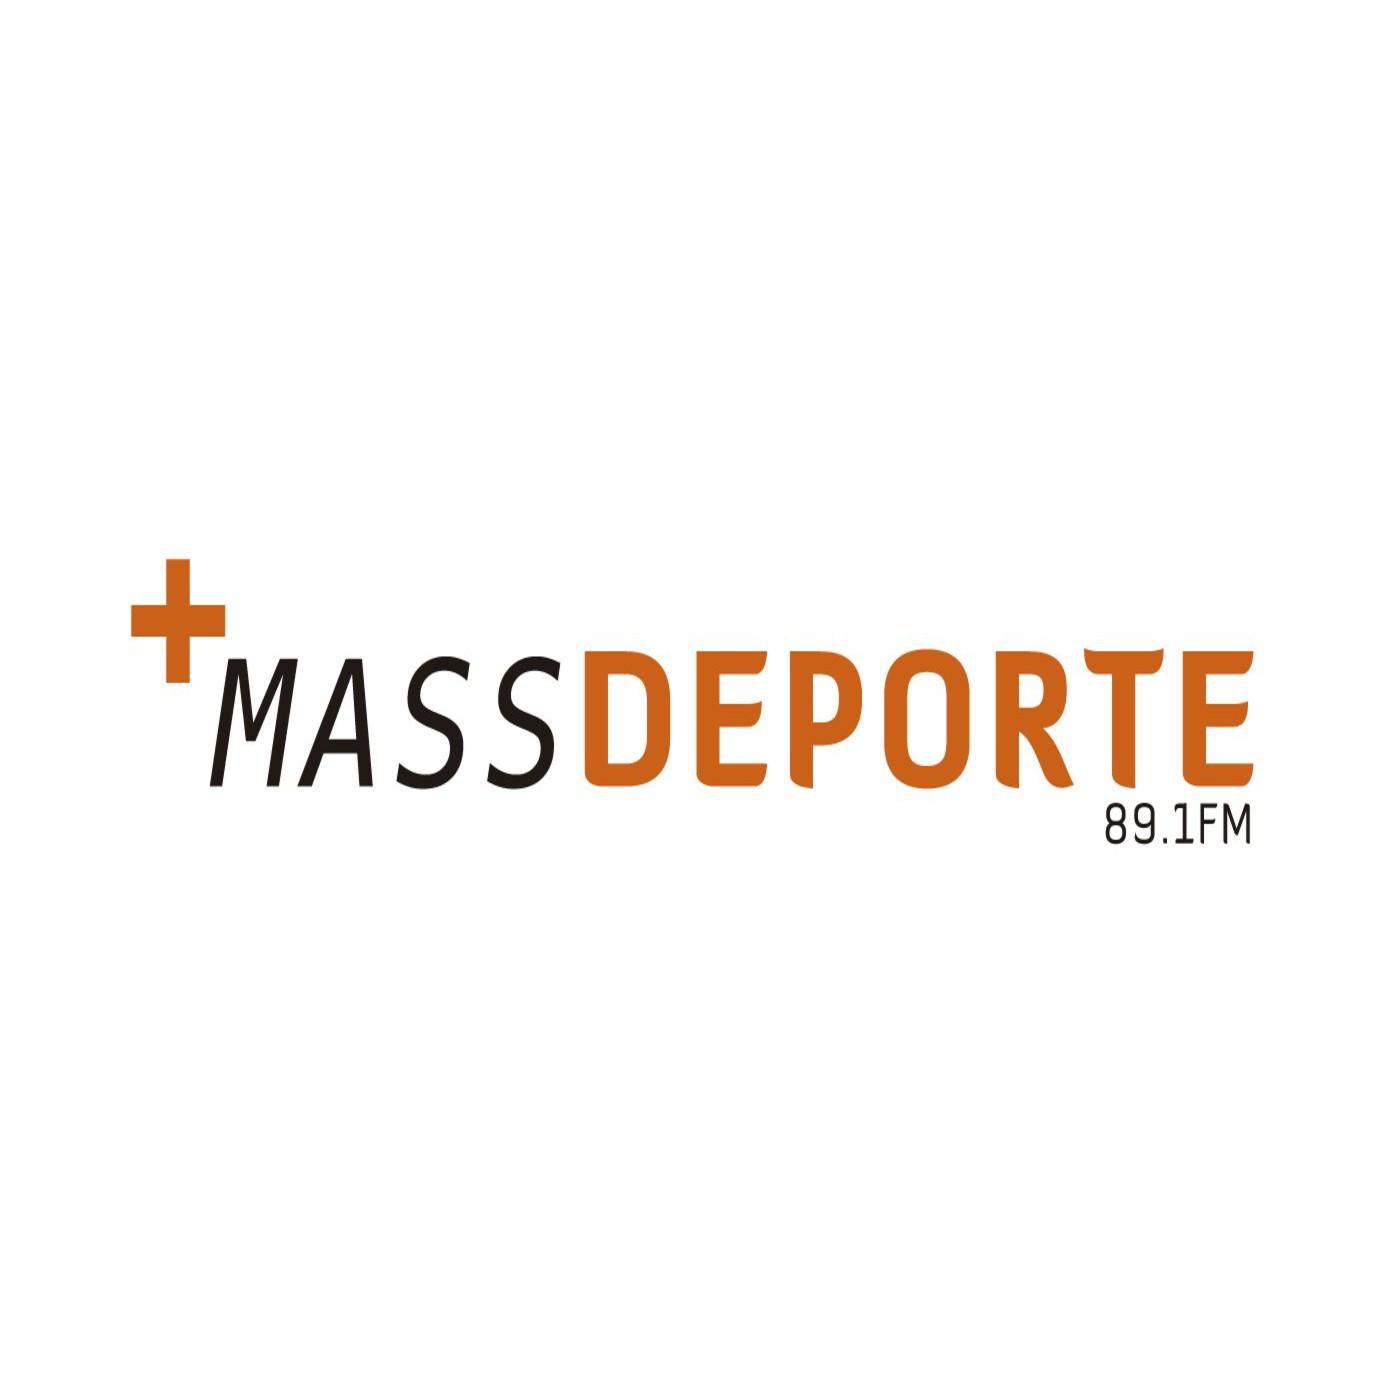 <![CDATA[Mass Deporte]]>